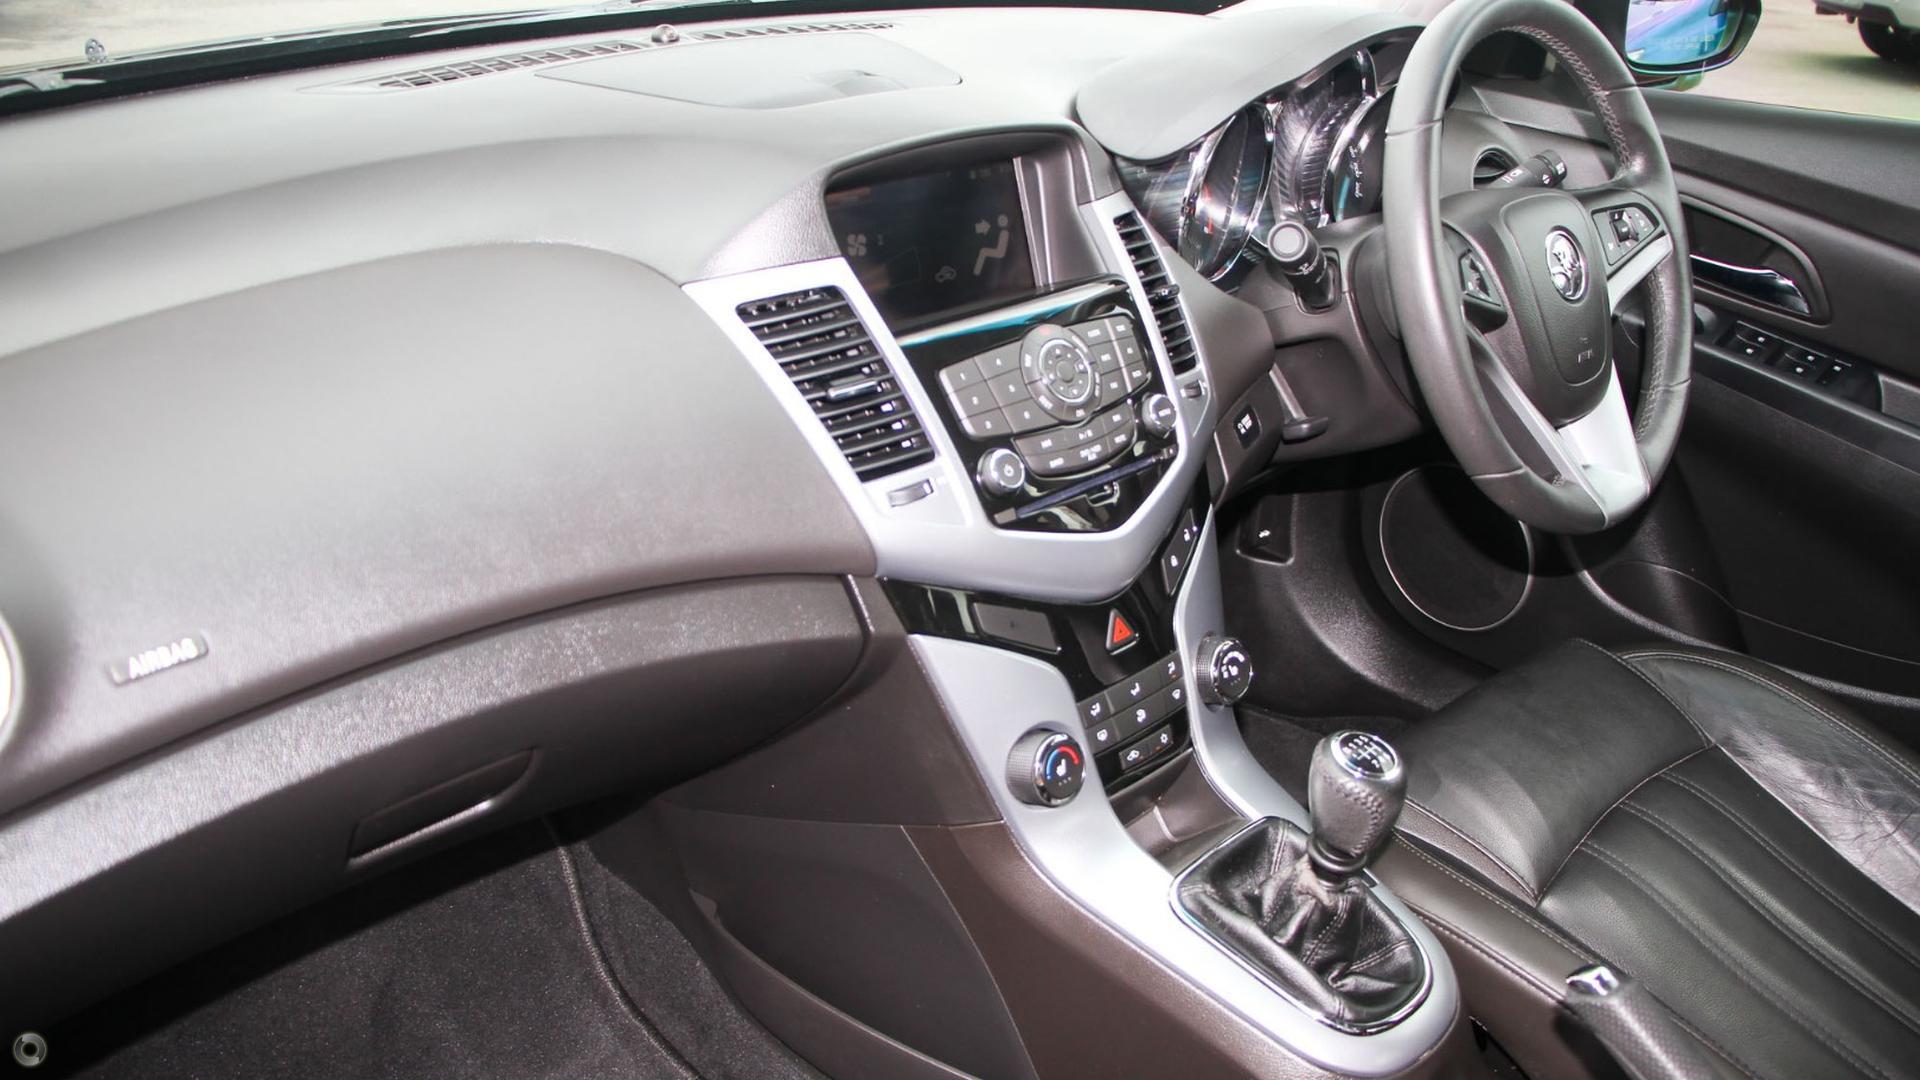 2011 Holden Cruze SRi-V JH Series II